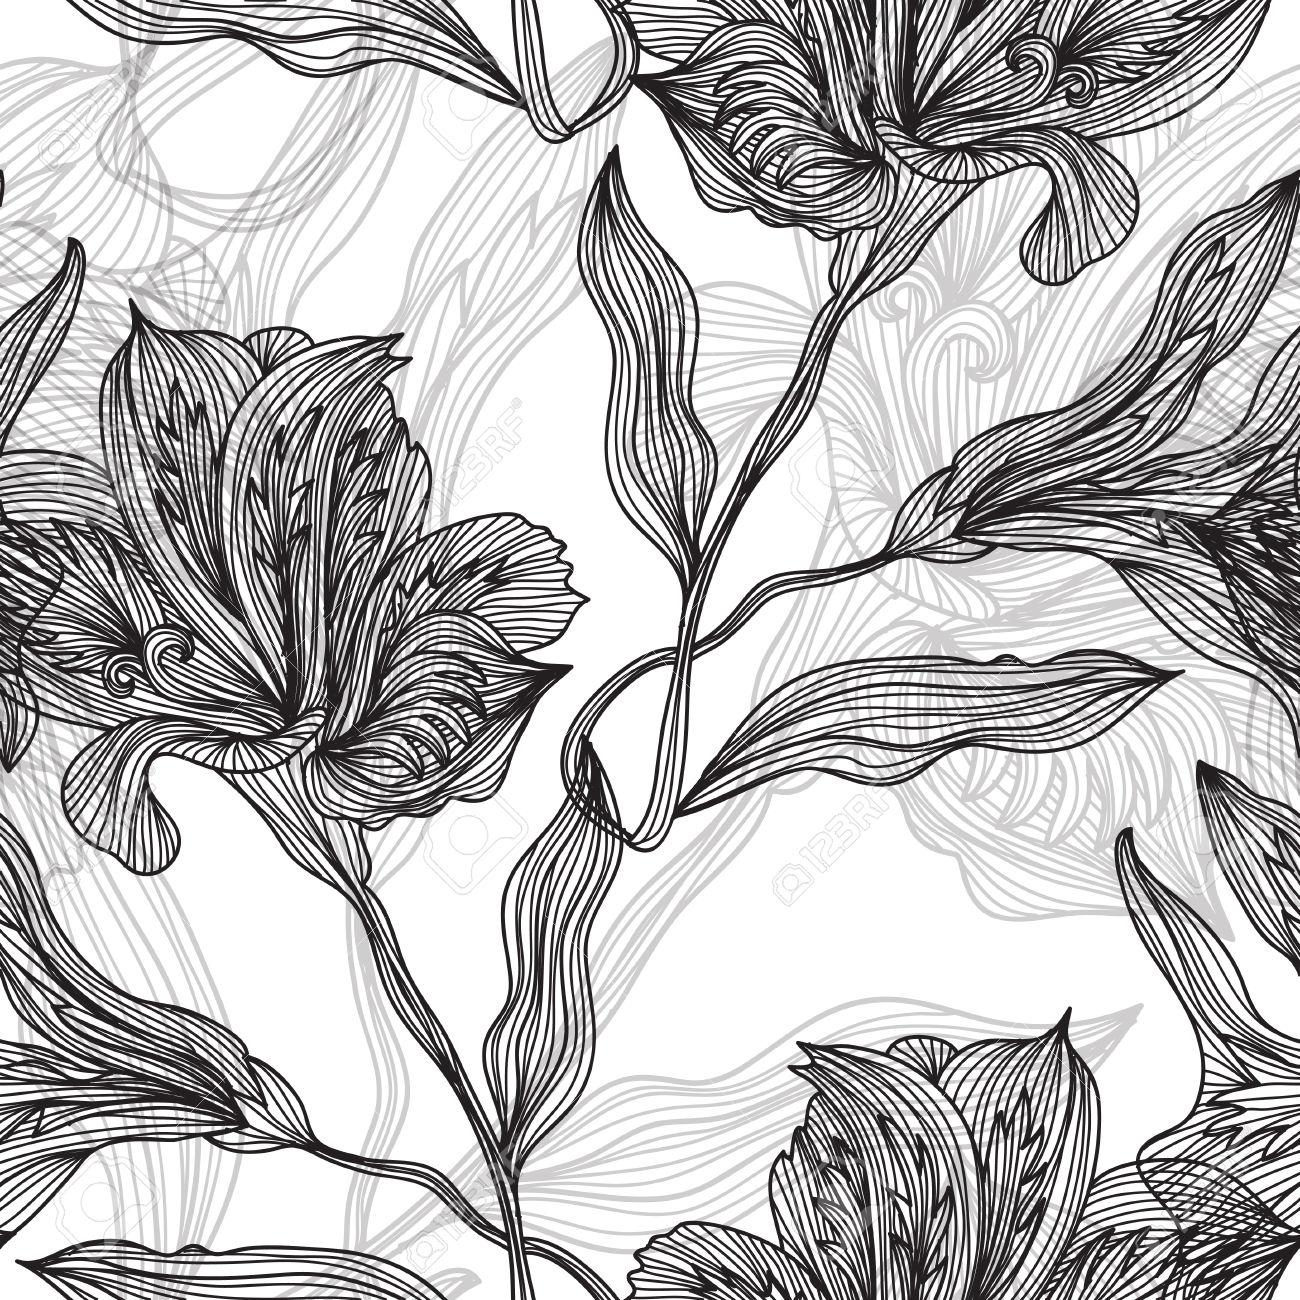 1300x1300 Botanical Illustrations Black And White